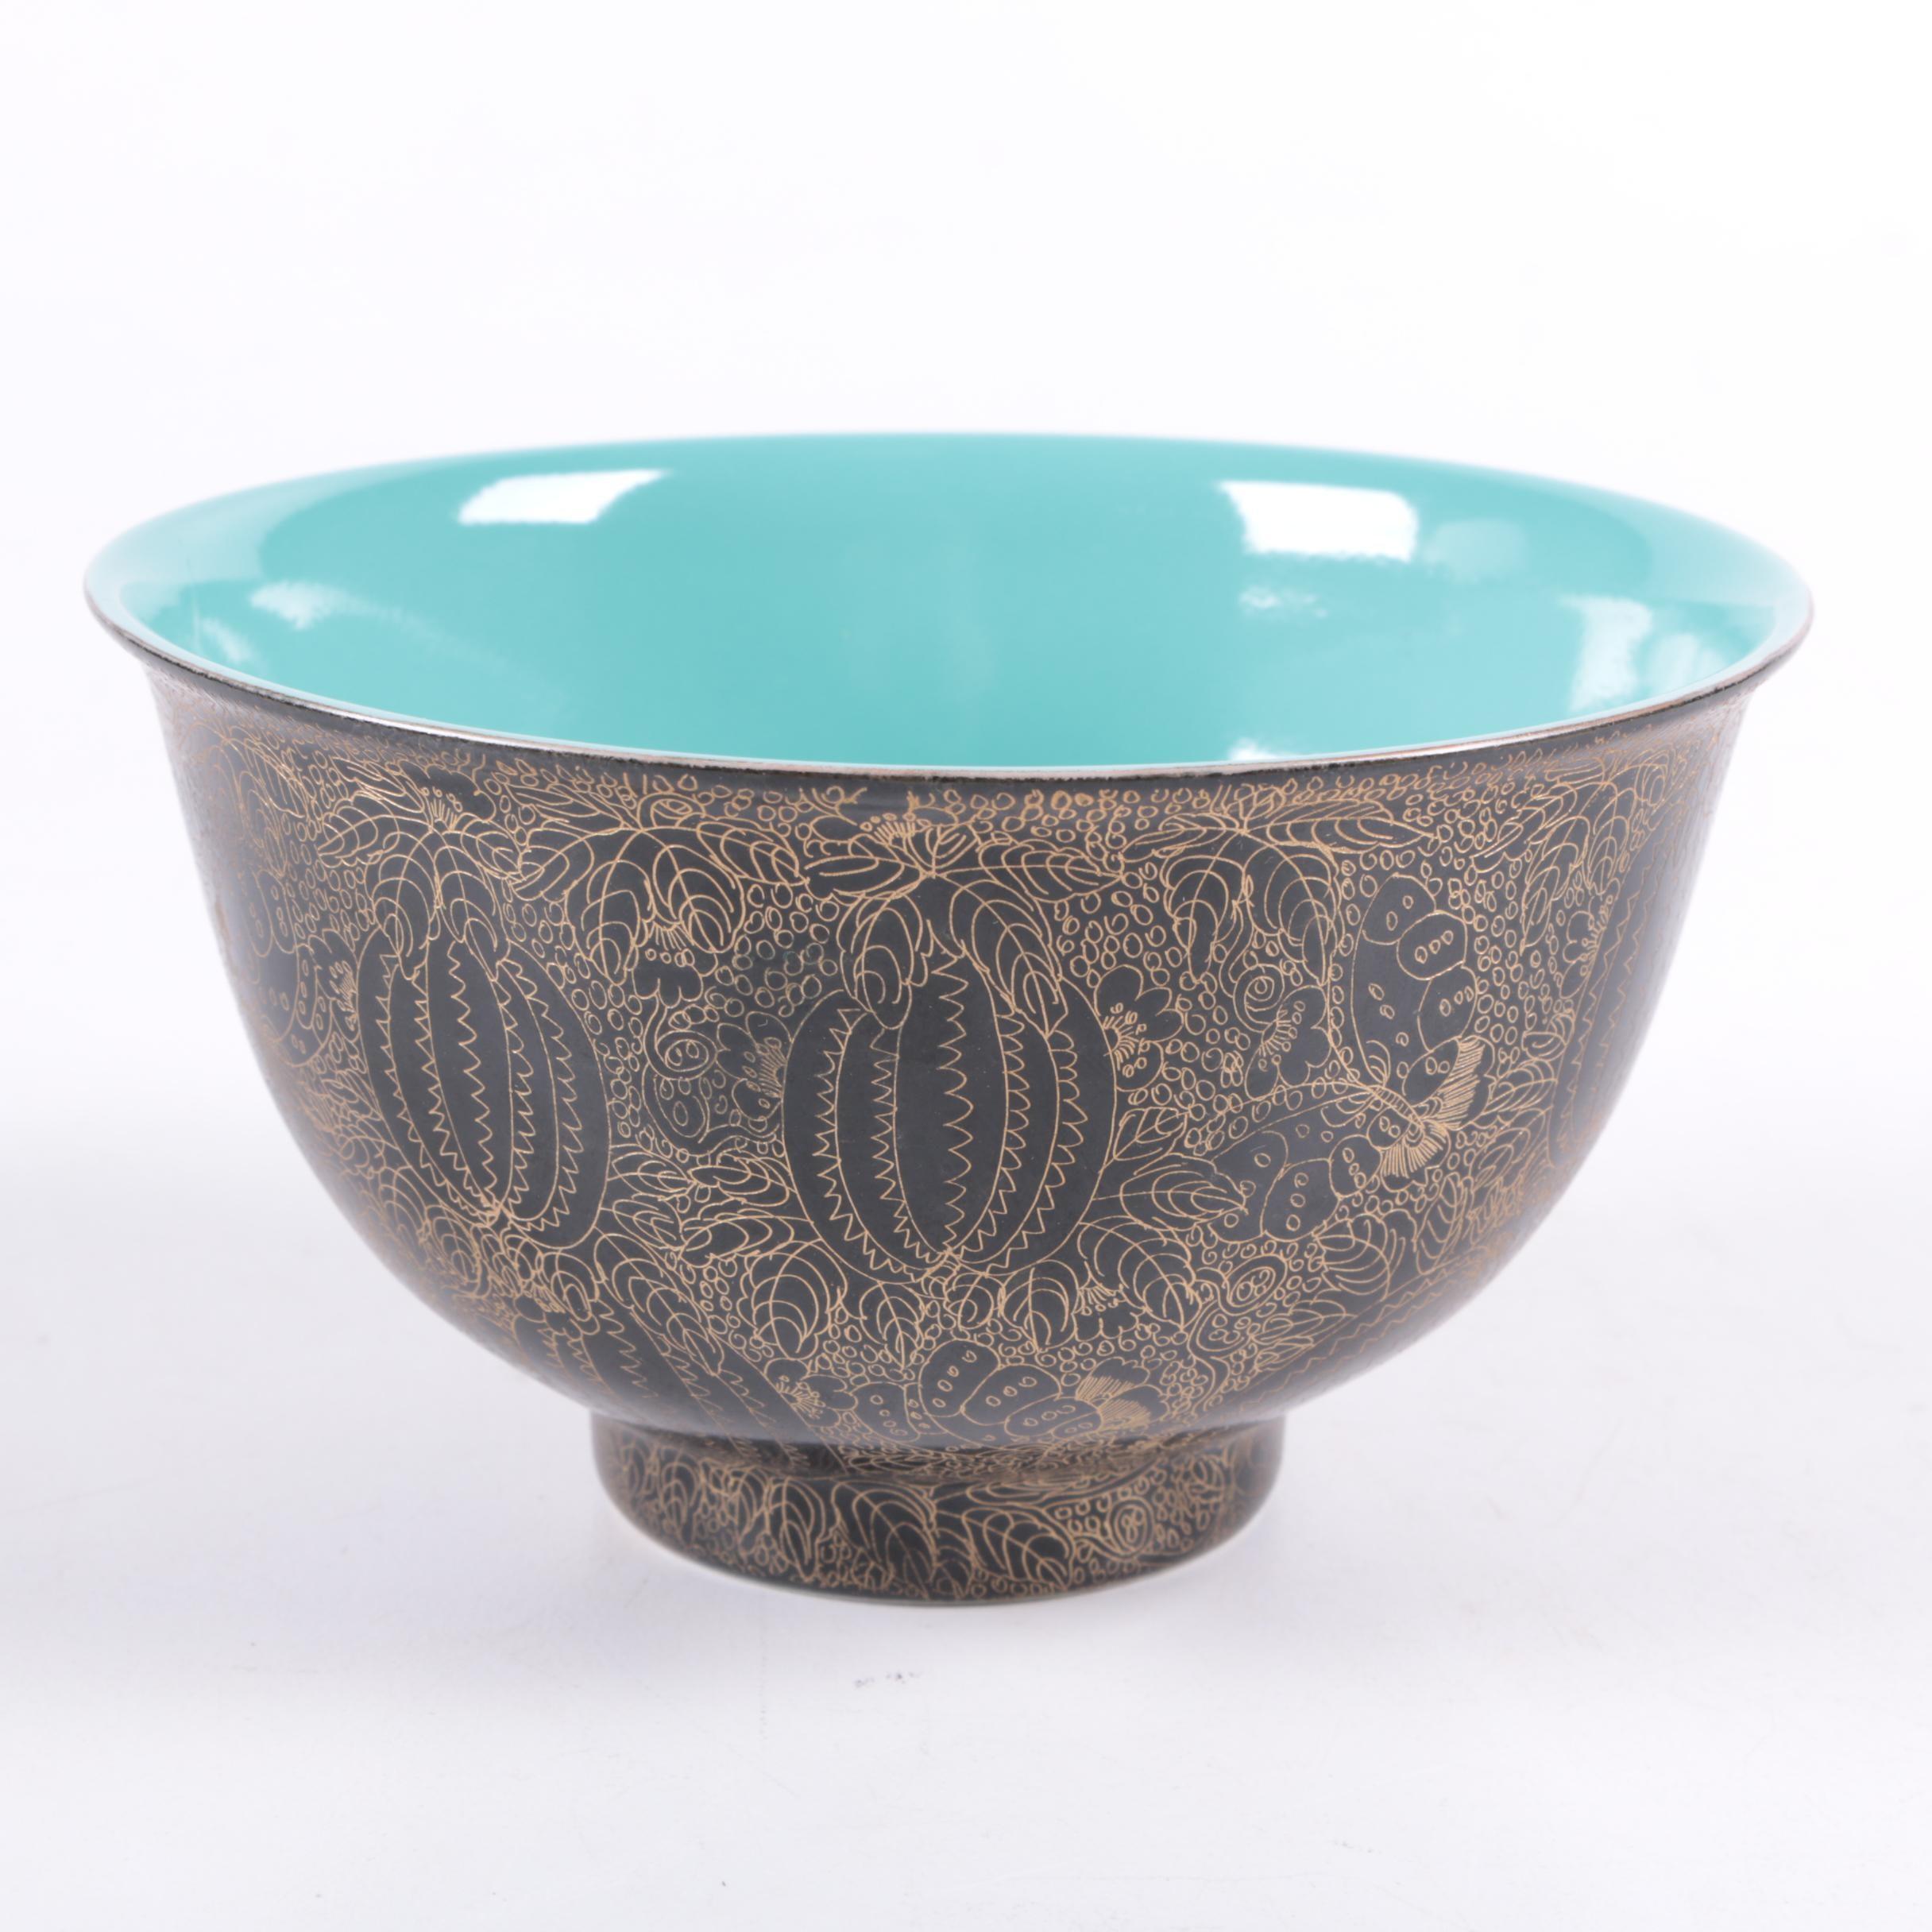 Decorative Chinese Porcelain Bowl